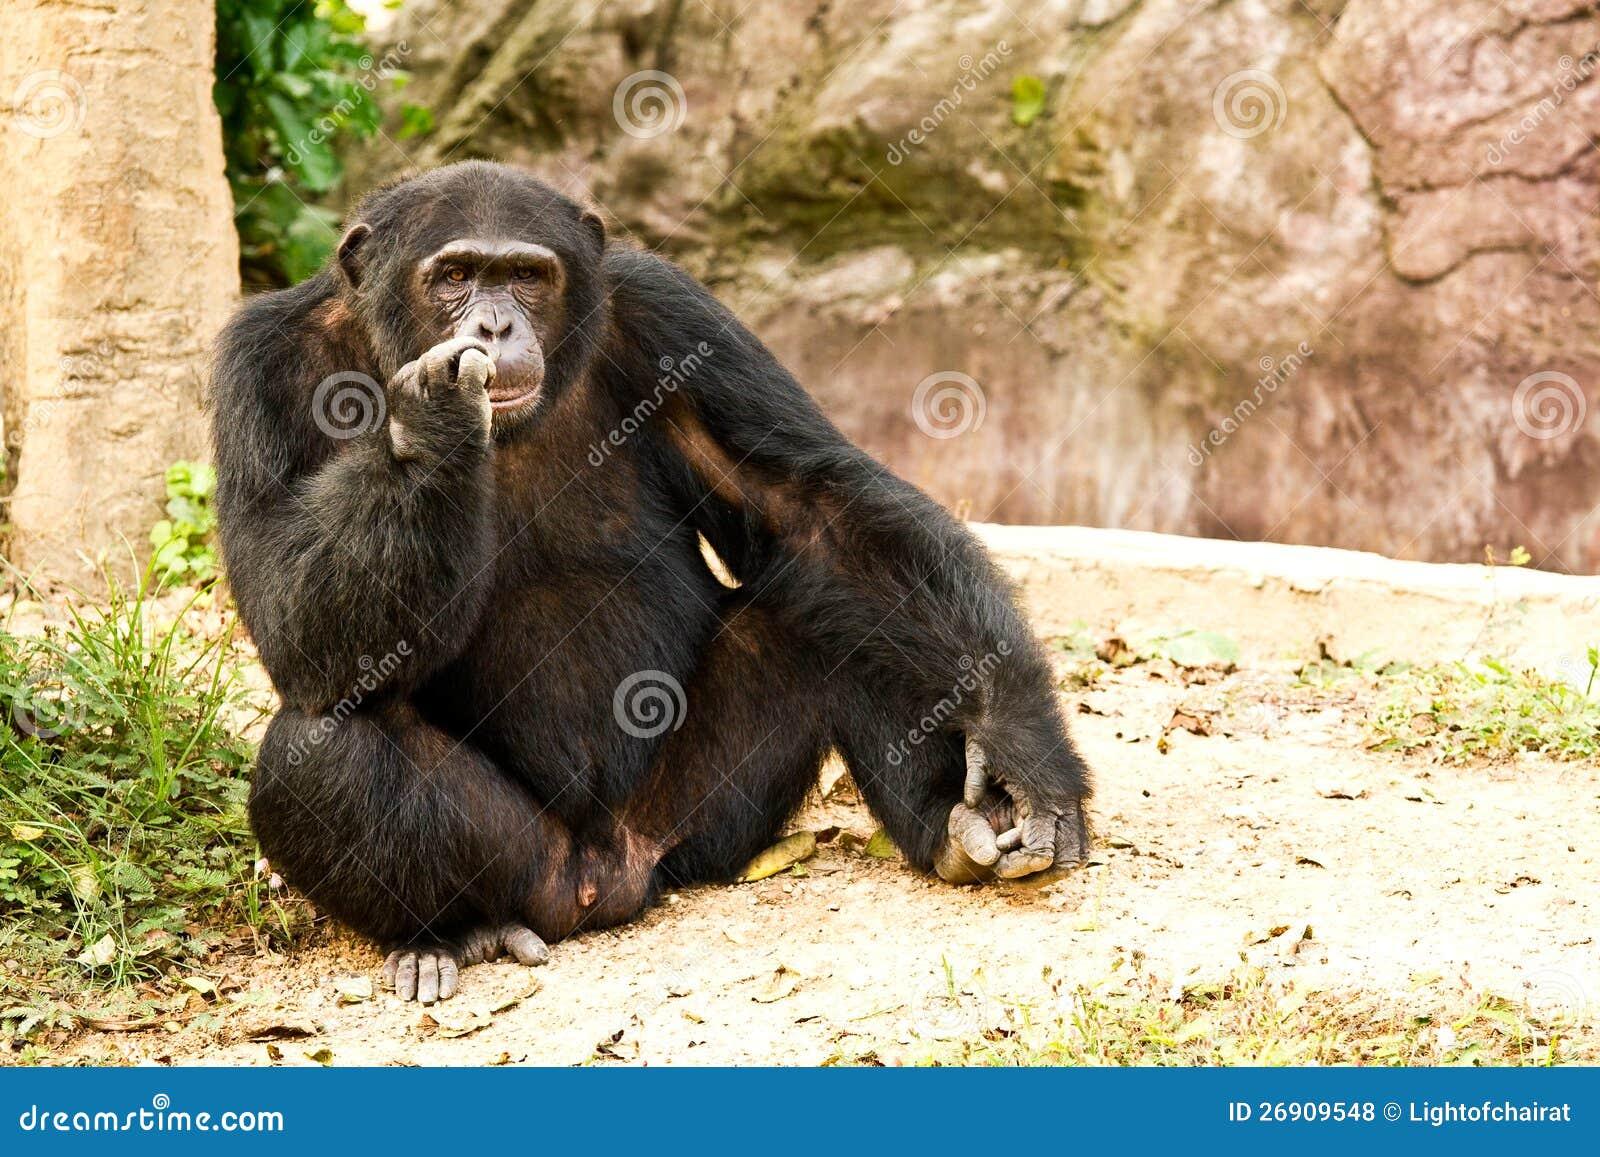 Chimpanzee Sitting By Some Bushes Royalty Free Stock Image ...  |Chimp Sitting